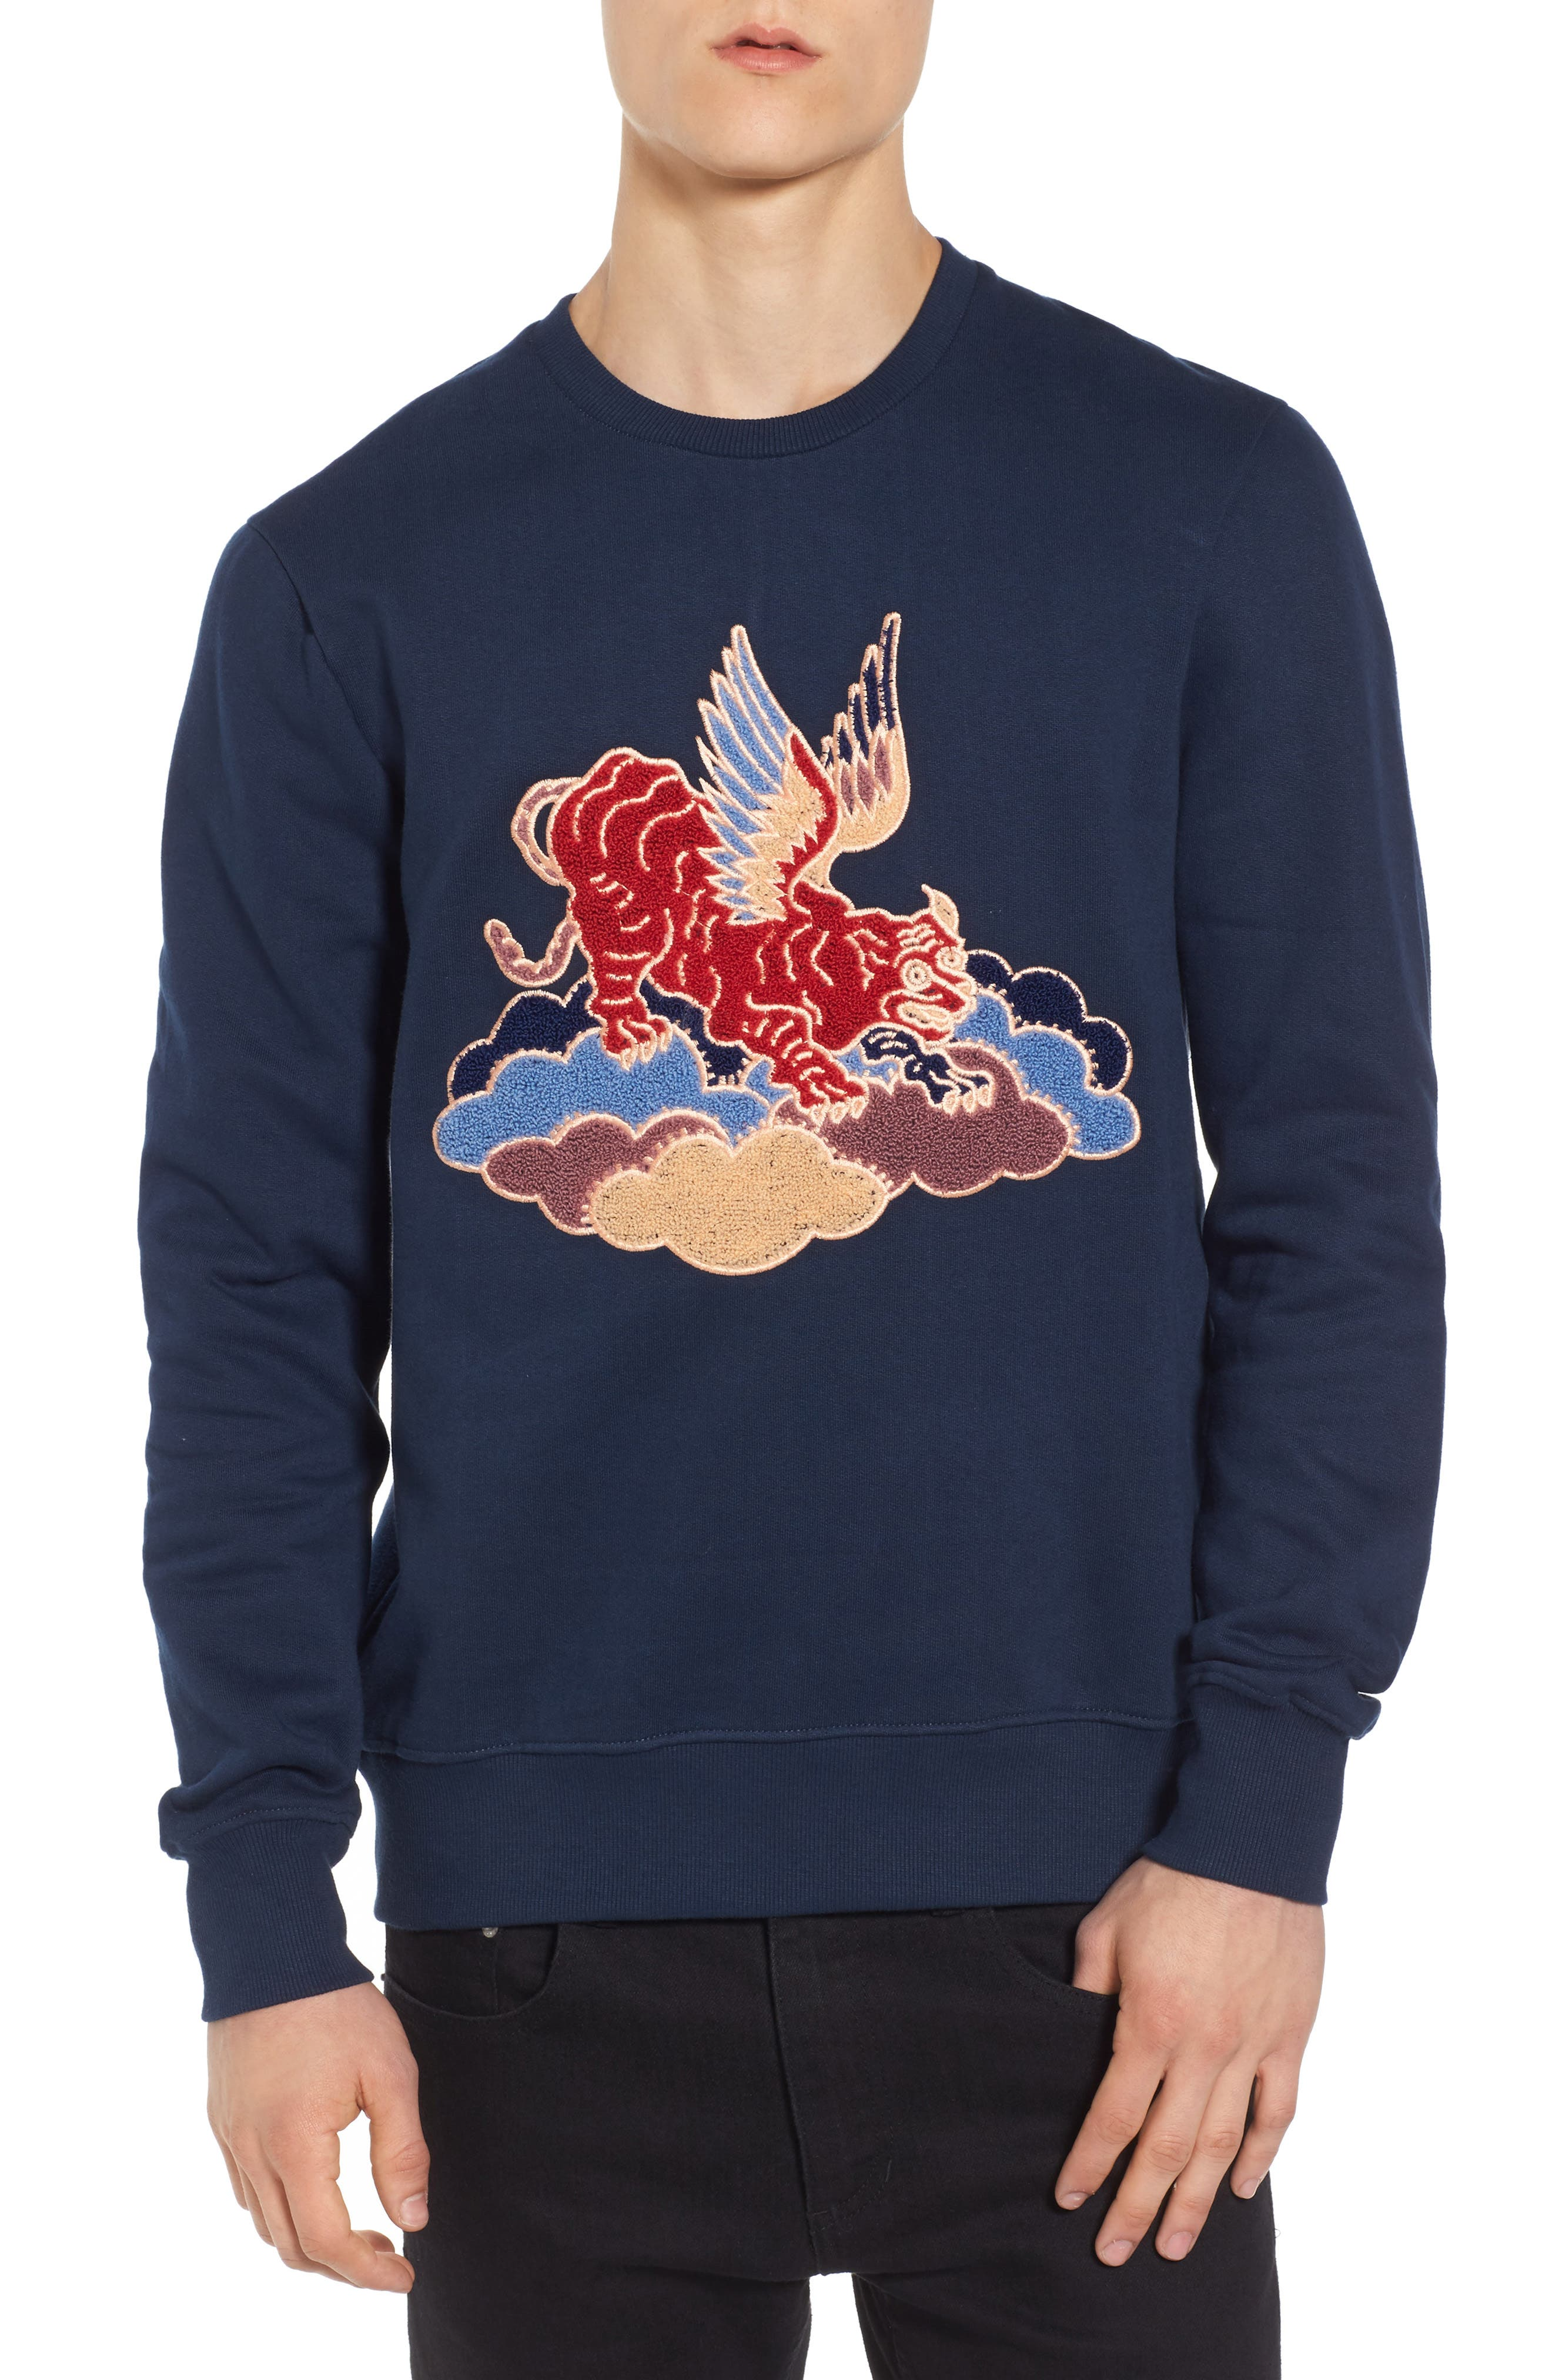 Nokat Appliqué Sweatshirt,                         Main,                         color, 018